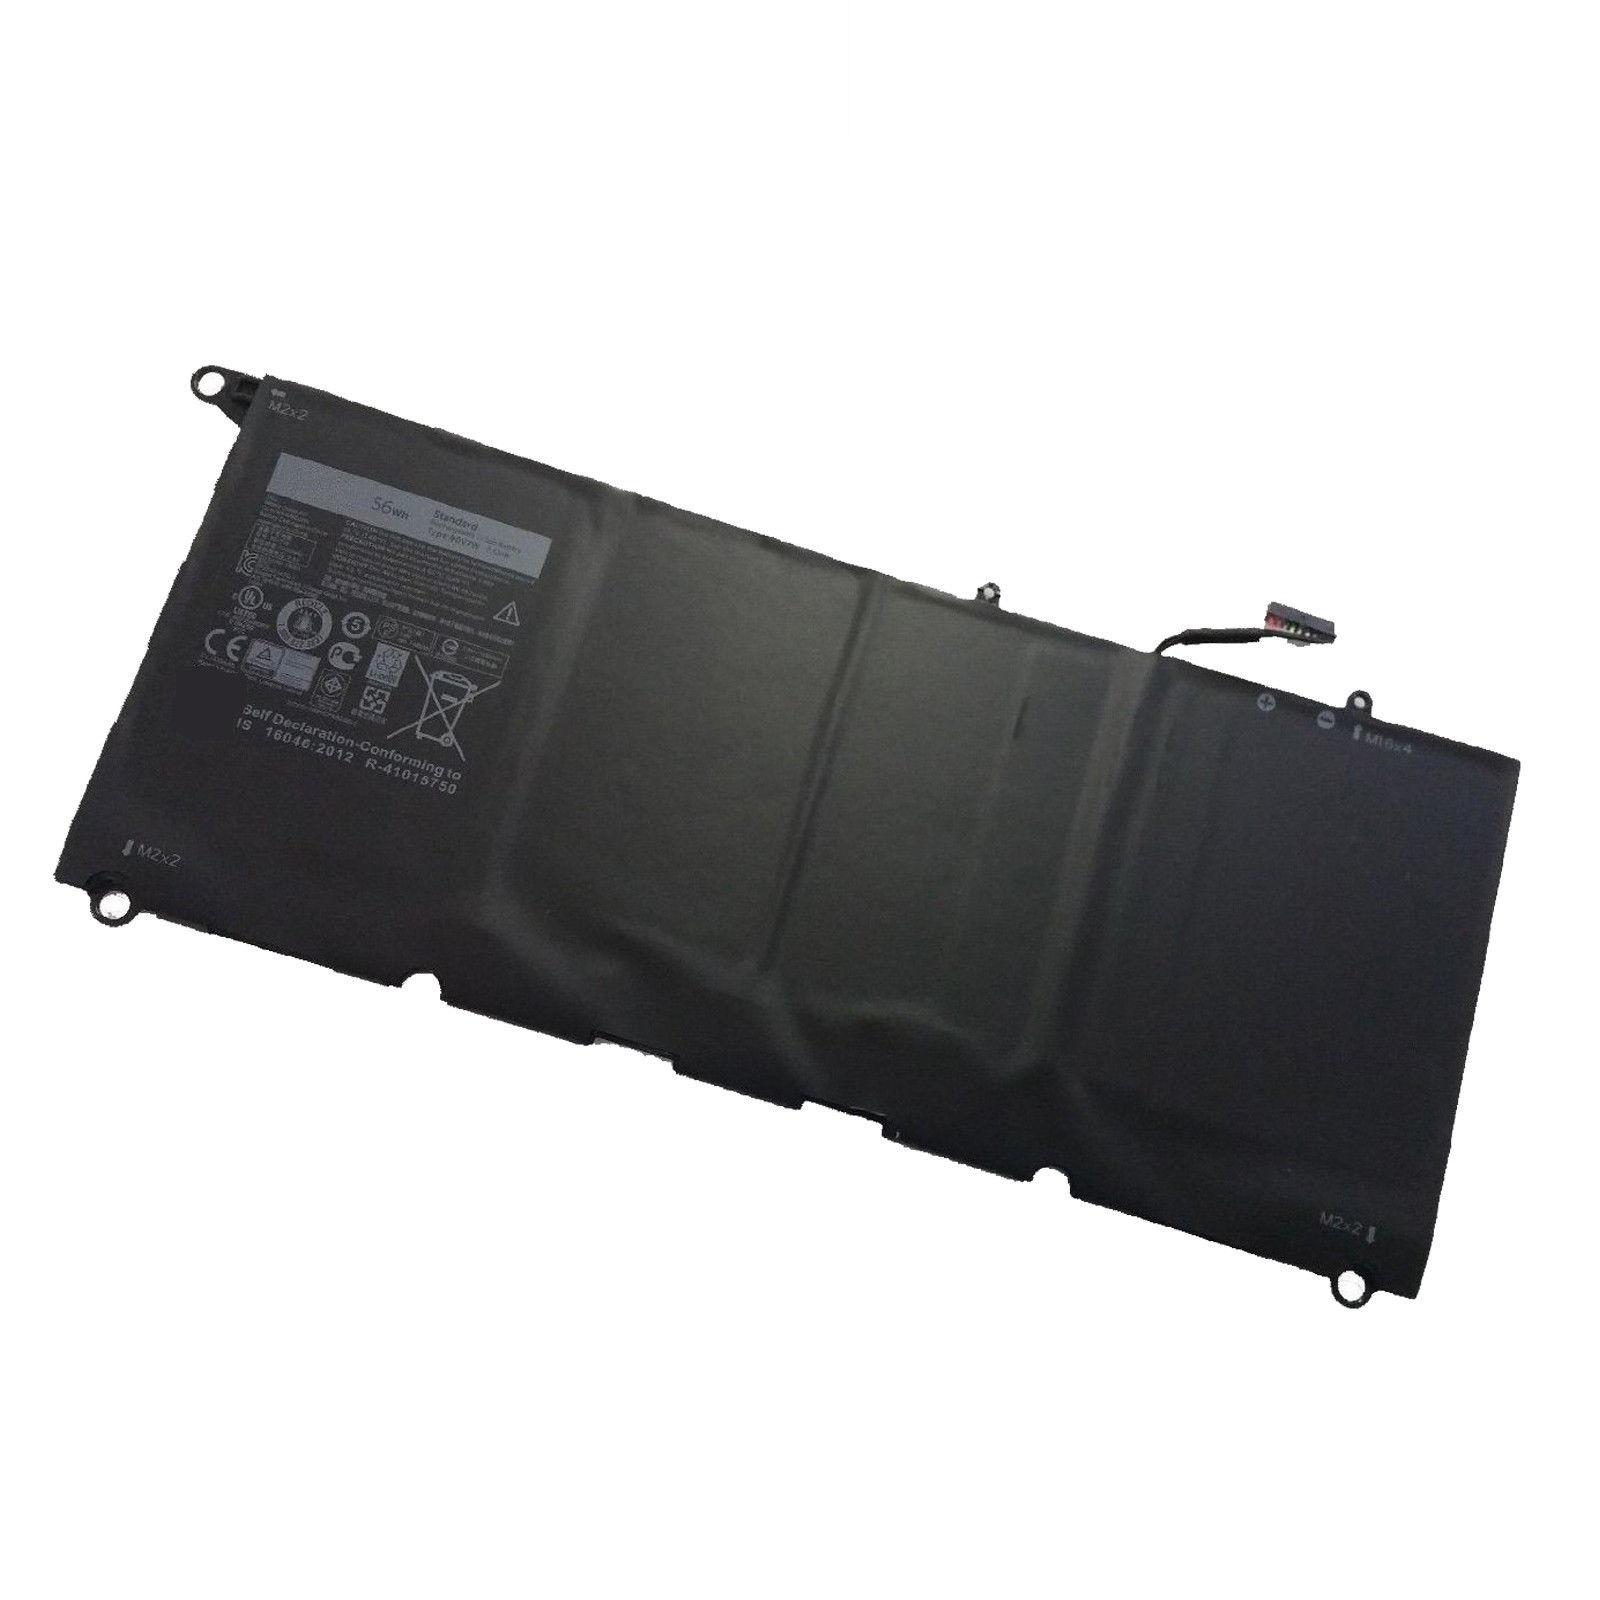 Bateria para Dell 0N7T6 90V7W